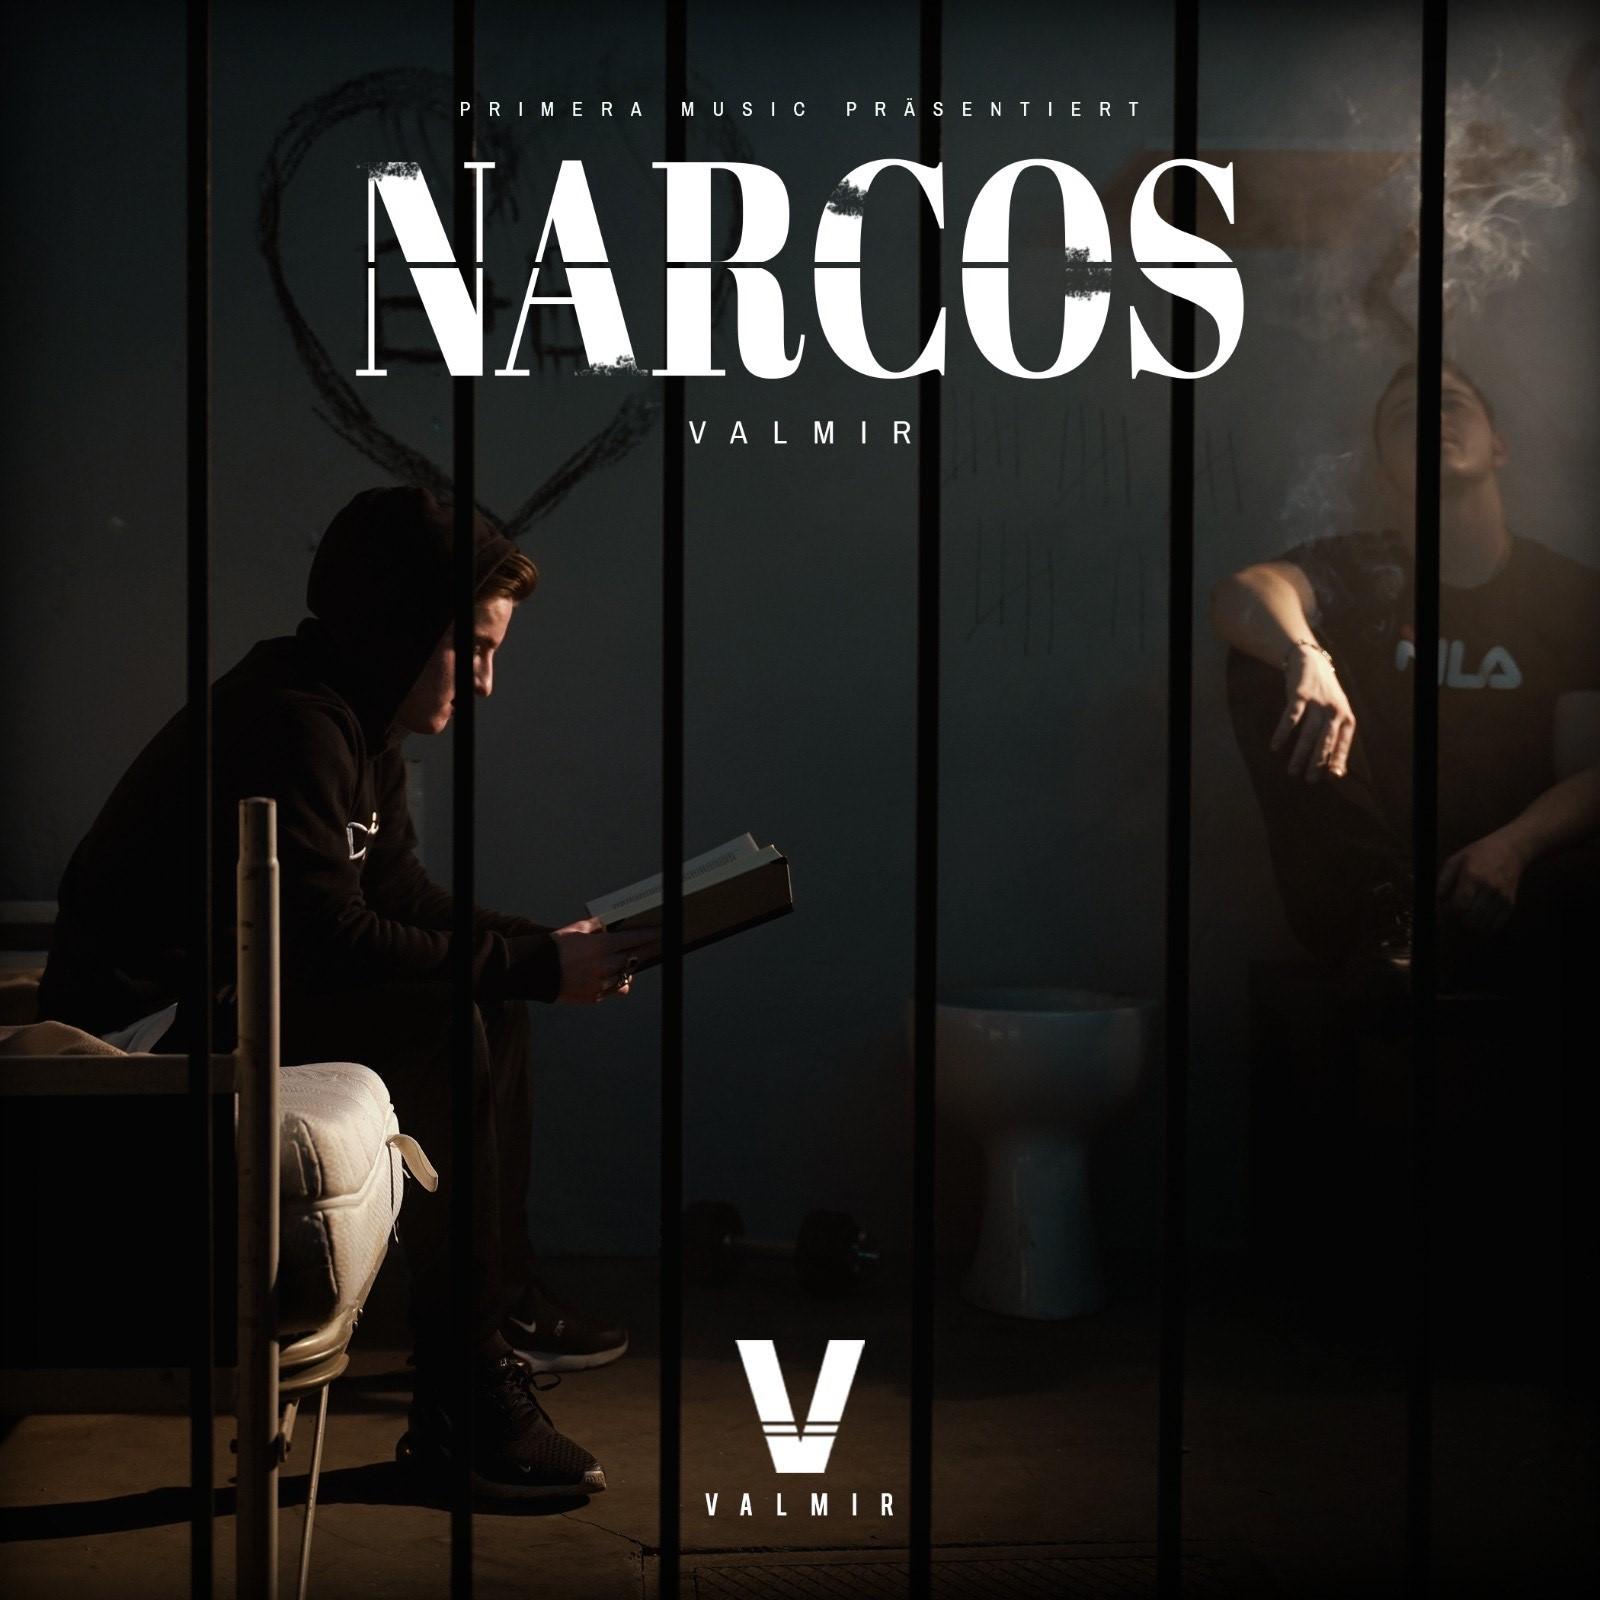 Upcoming: VALMIR - Narcos